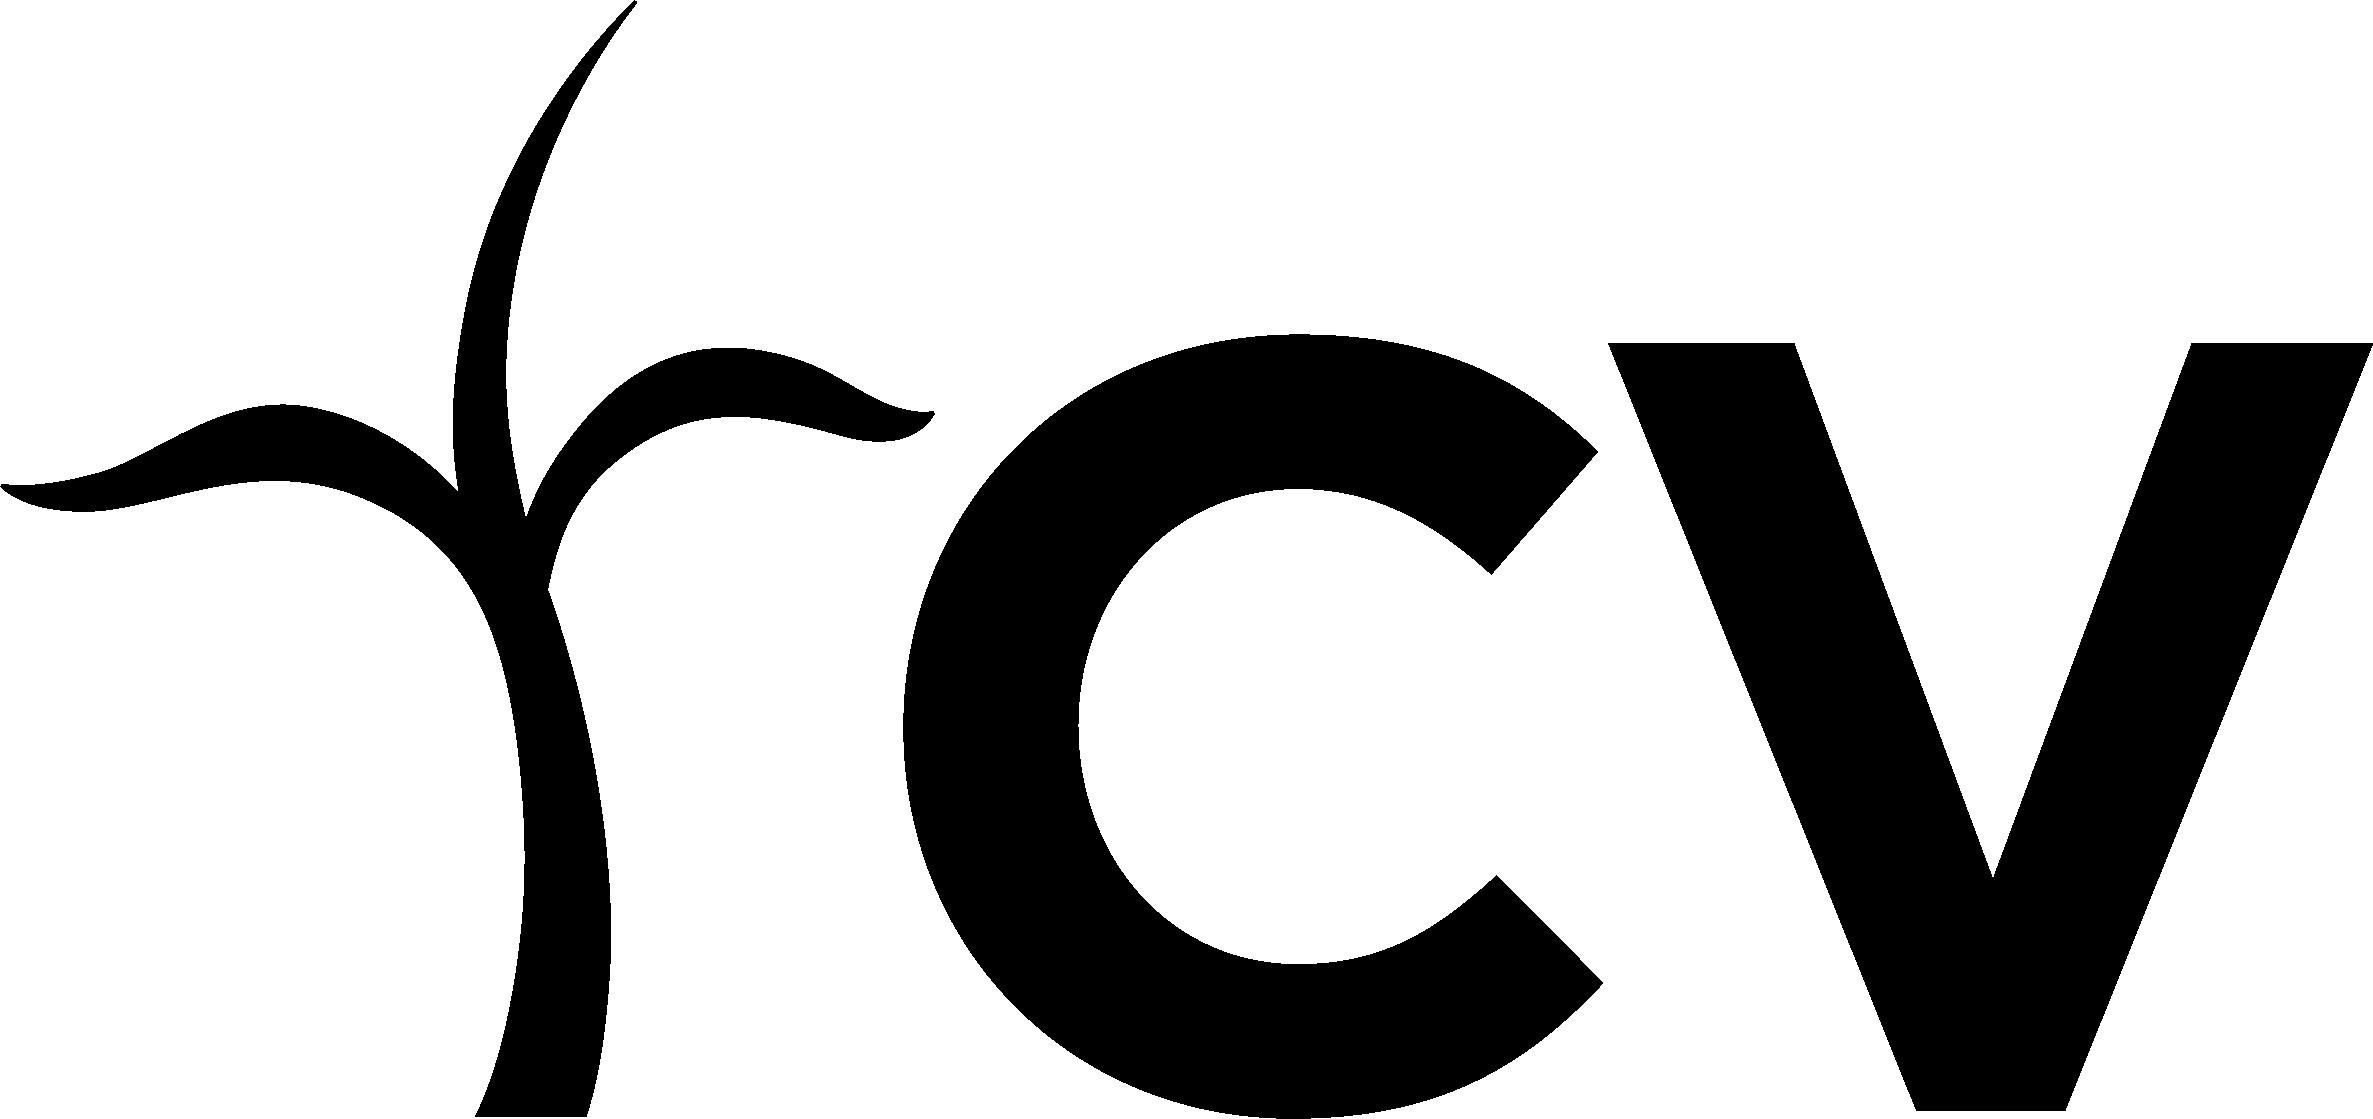 cv-logo-black-ƒ